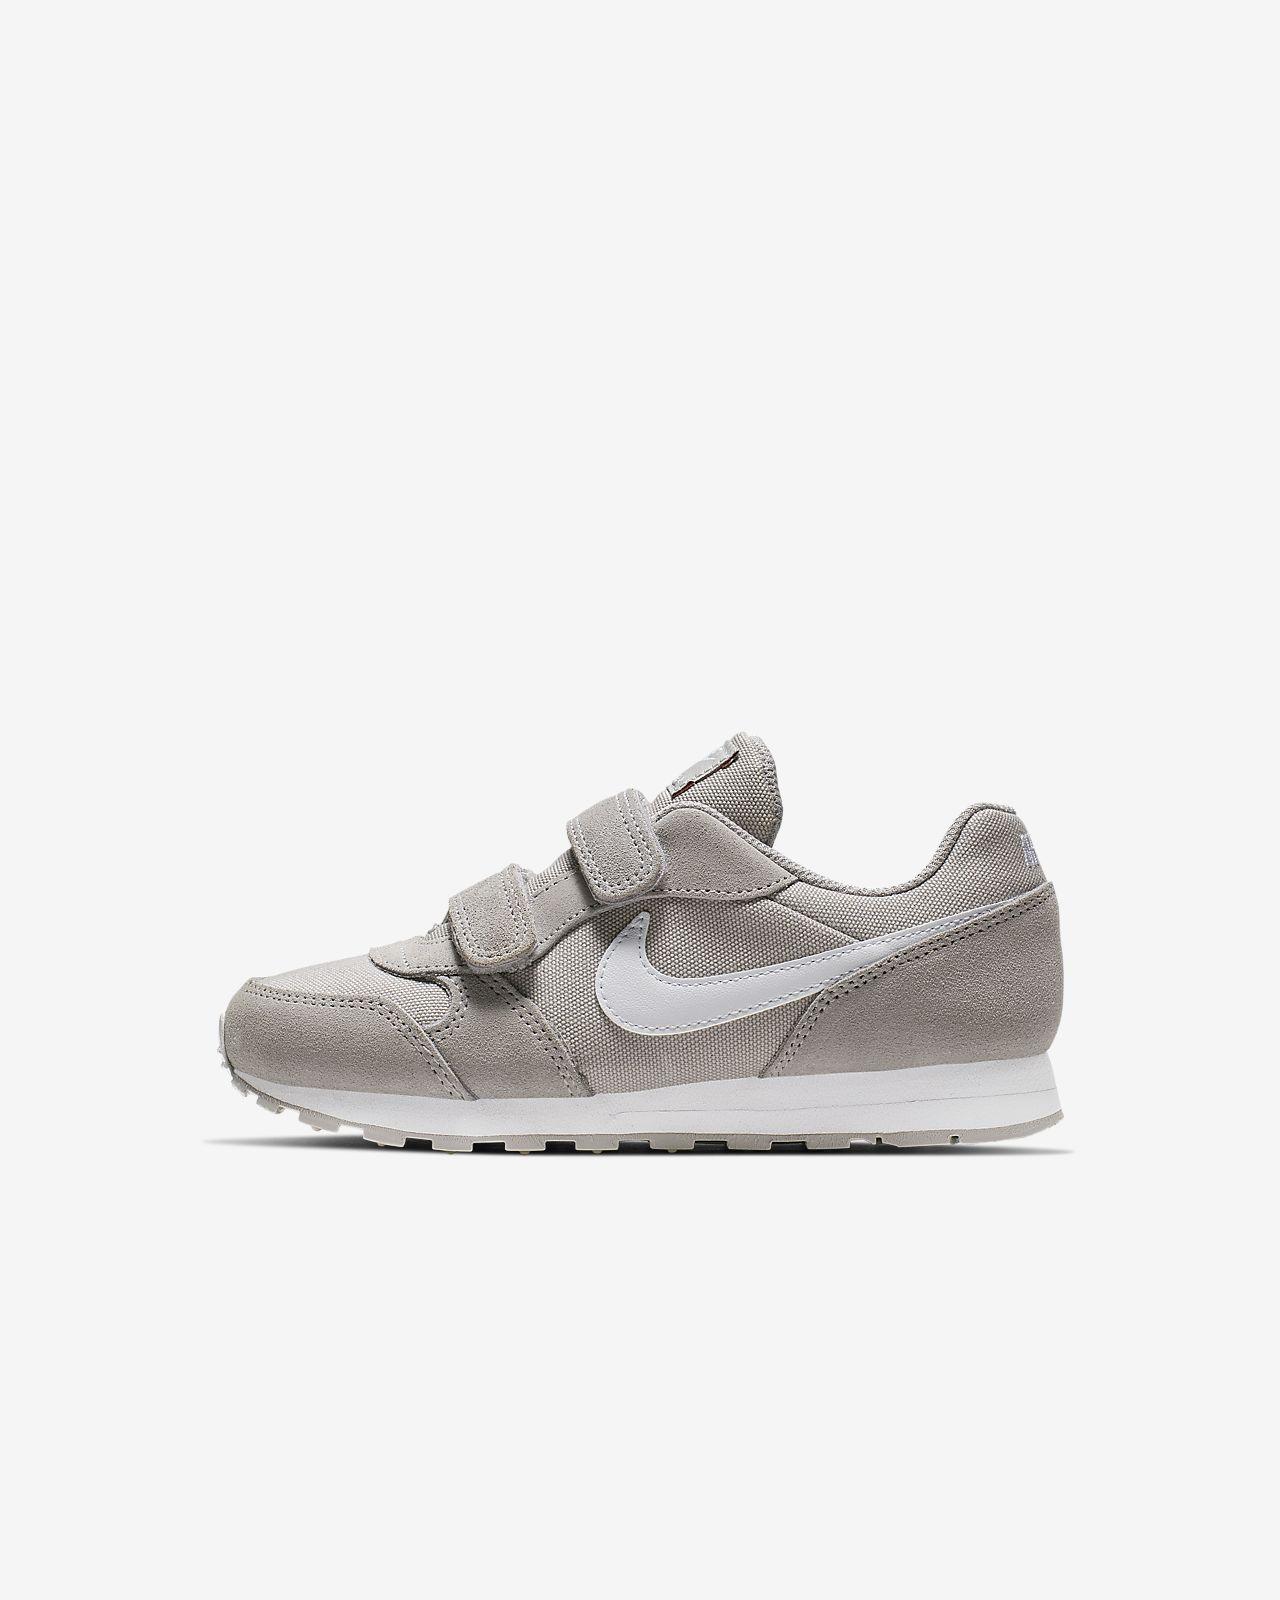 Nike MD Runner 2 PE Schuh für jüngere Kinder